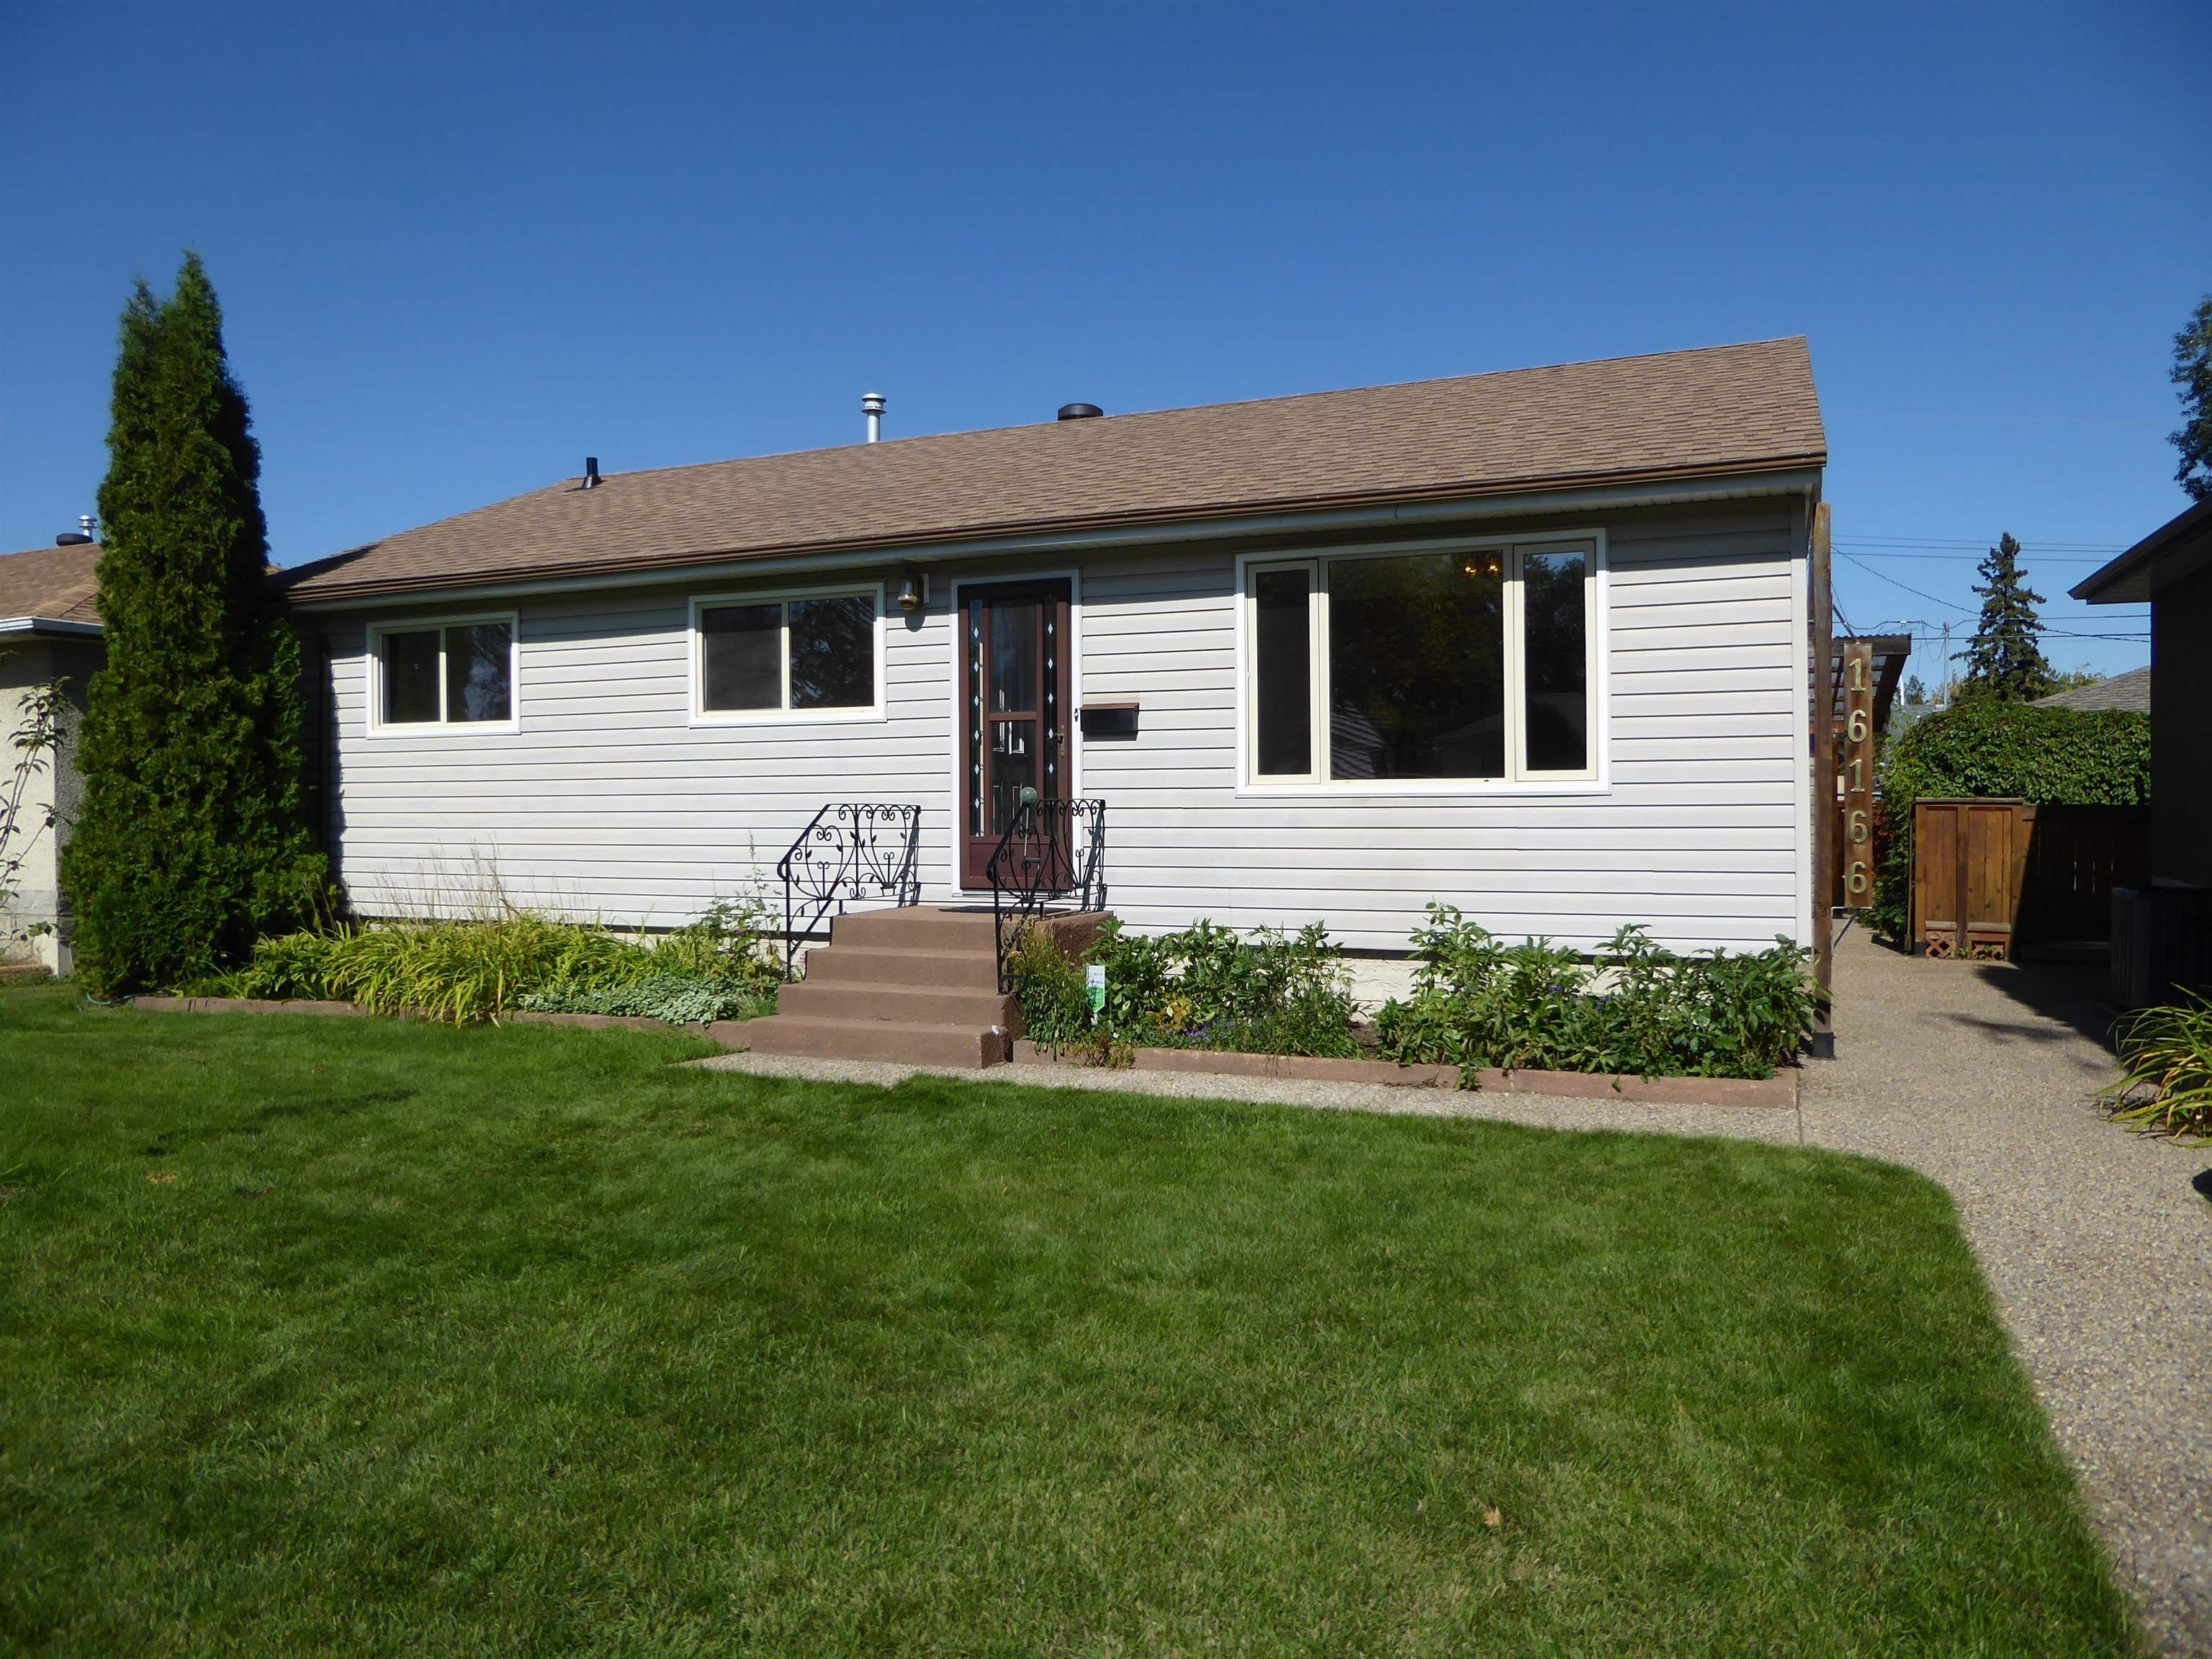 Main Photo: 16166 107A Avenue in Edmonton: Zone 21 House for sale : MLS®# E4262856